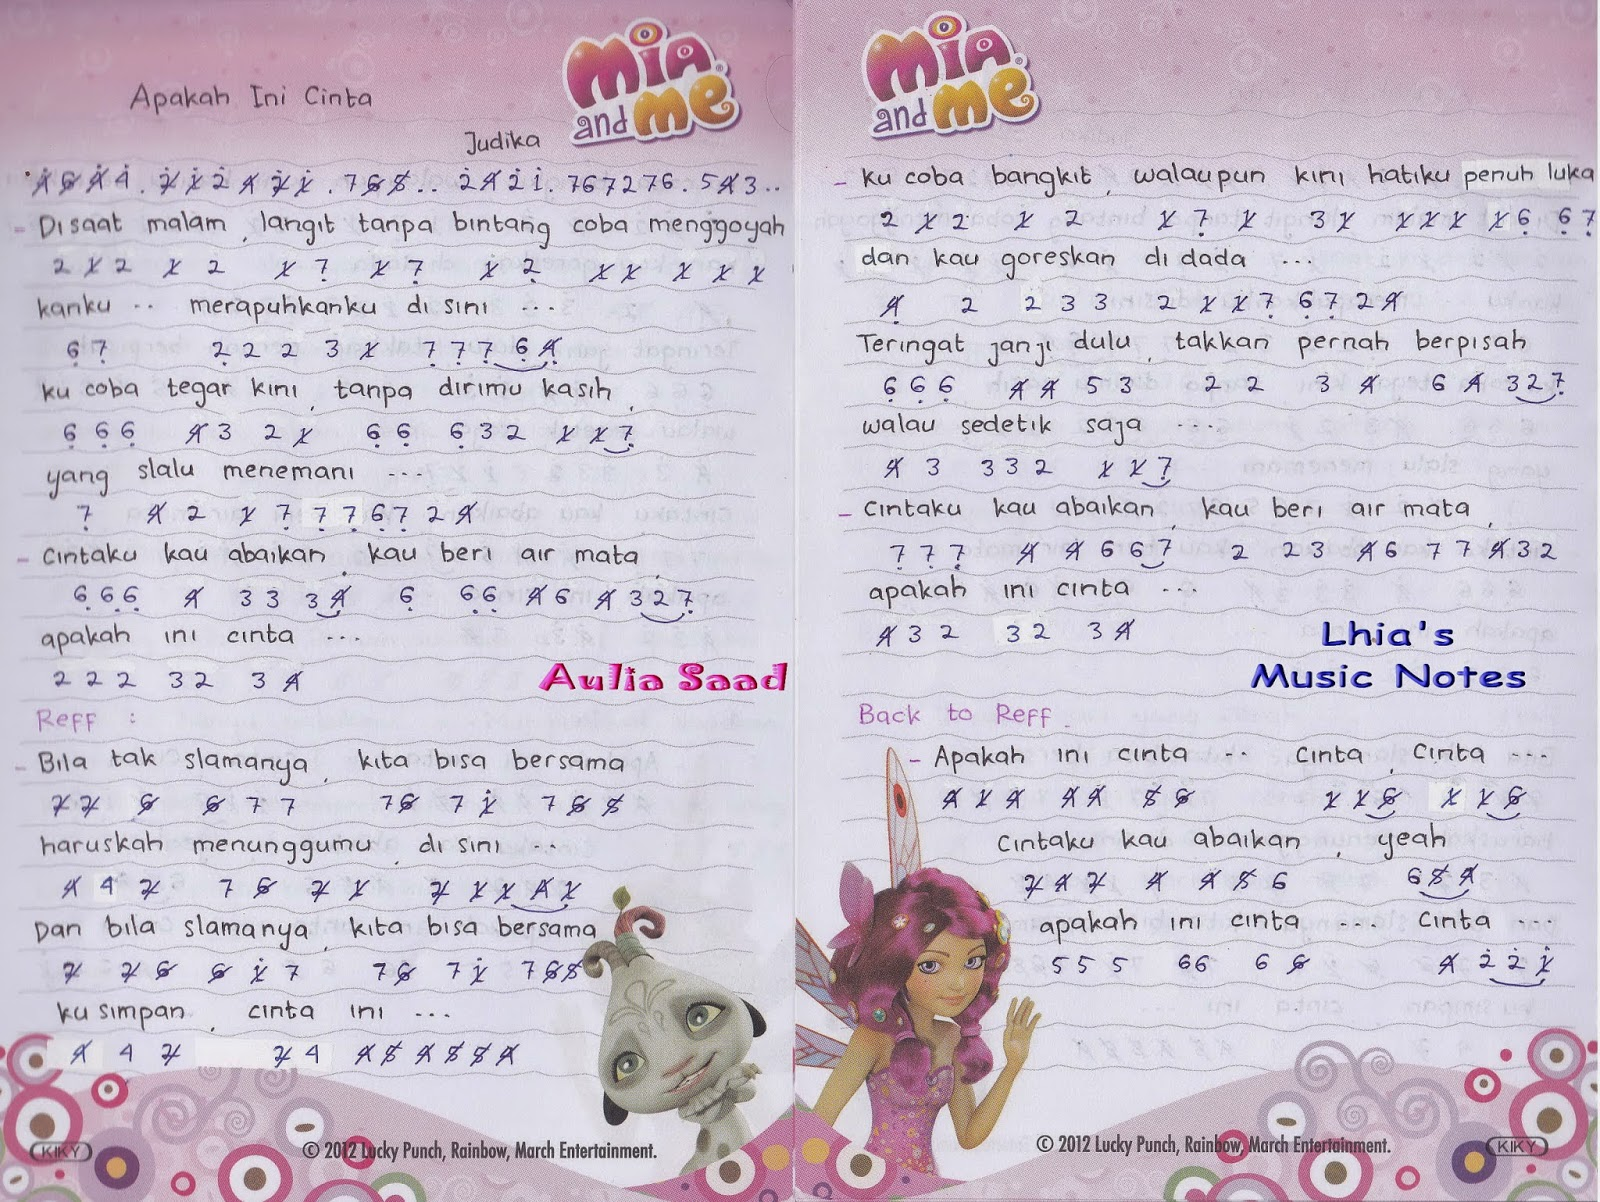 Not Angka : Judika – Apakah Ini Cinta | Lhia's Music Notes